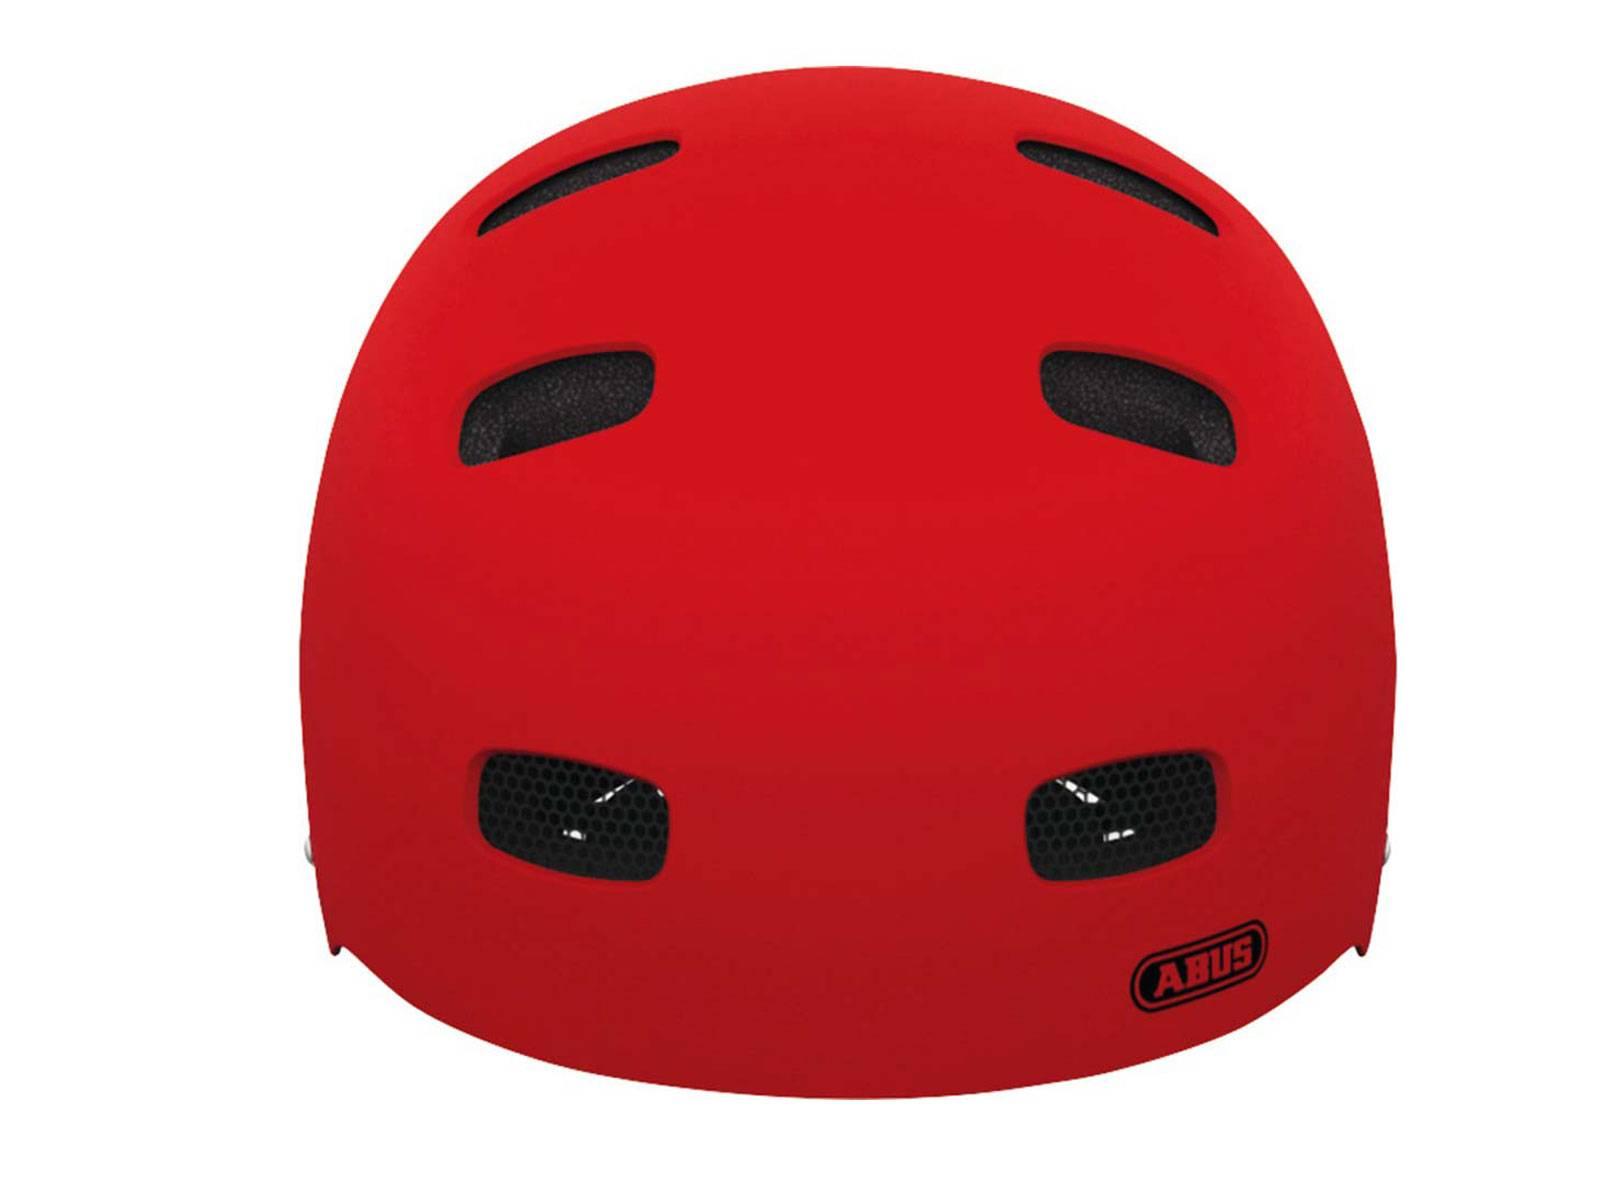 abus fietshelm scraper kid 2 0 s rood fietscomfort. Black Bedroom Furniture Sets. Home Design Ideas